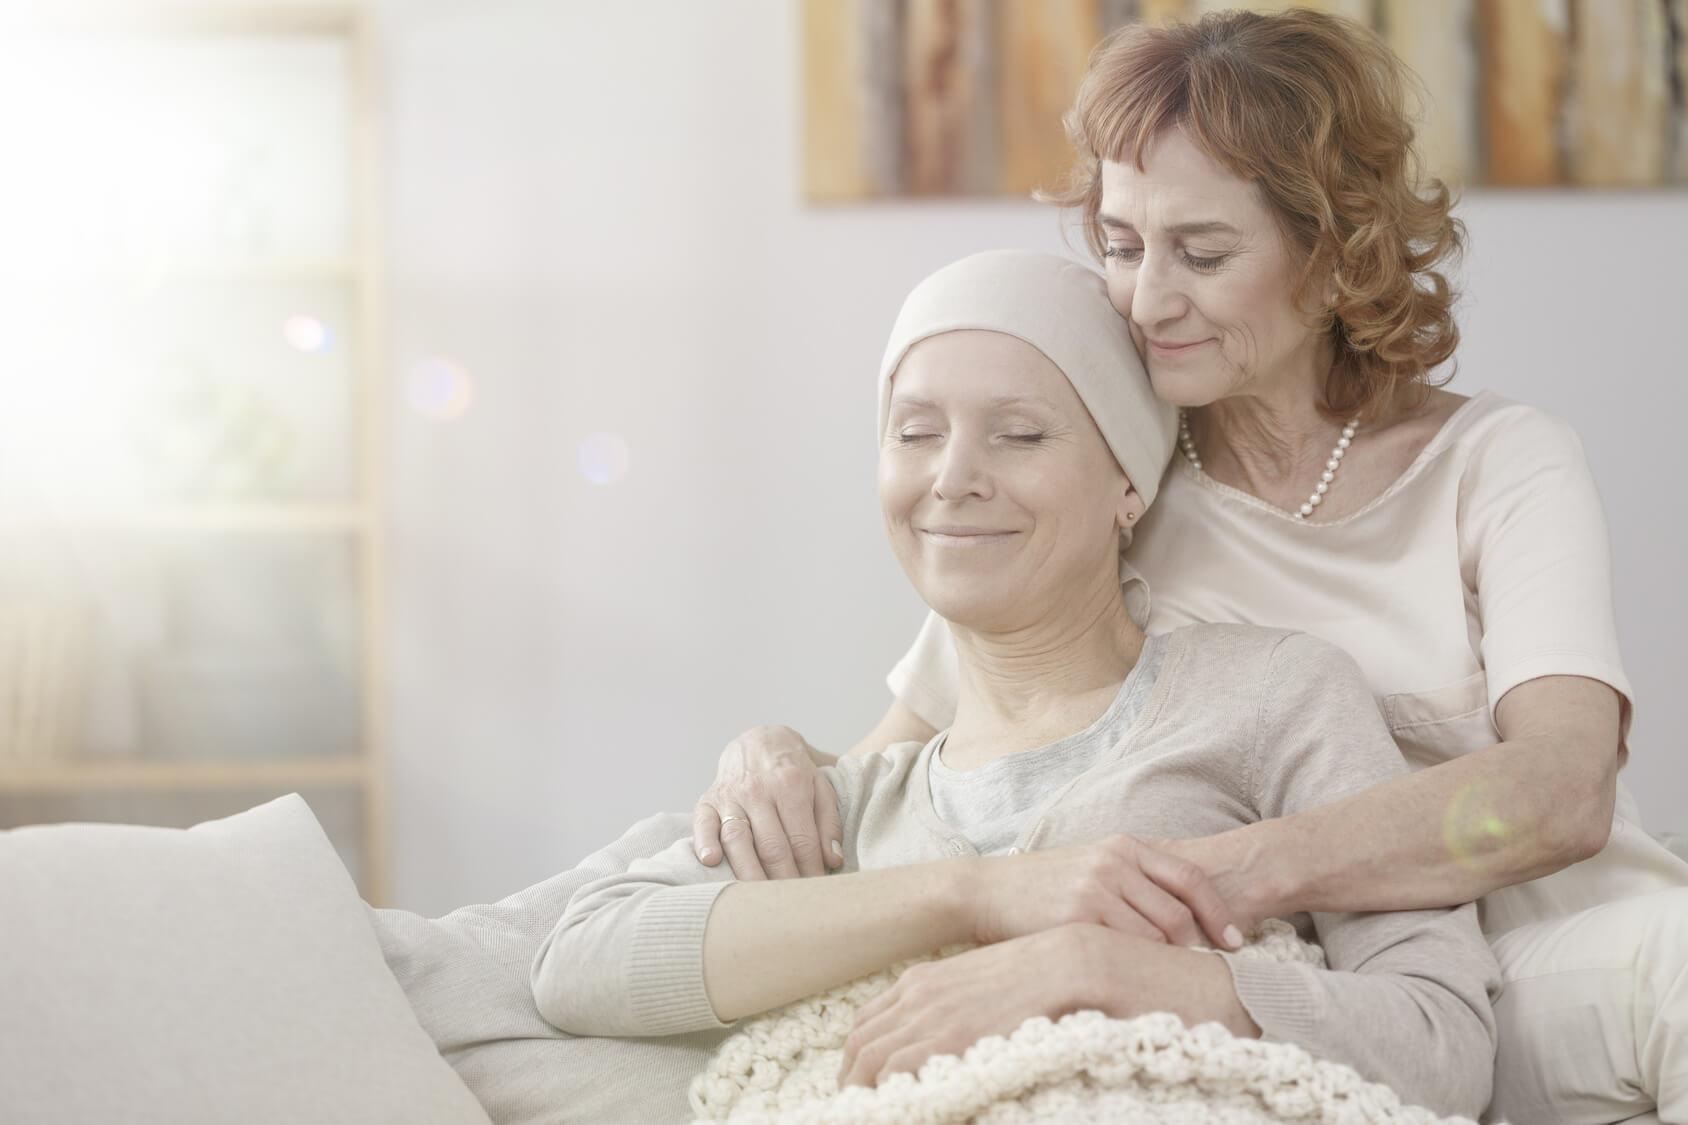 Diagnose Brustkrebs: Hilfe annehmen!